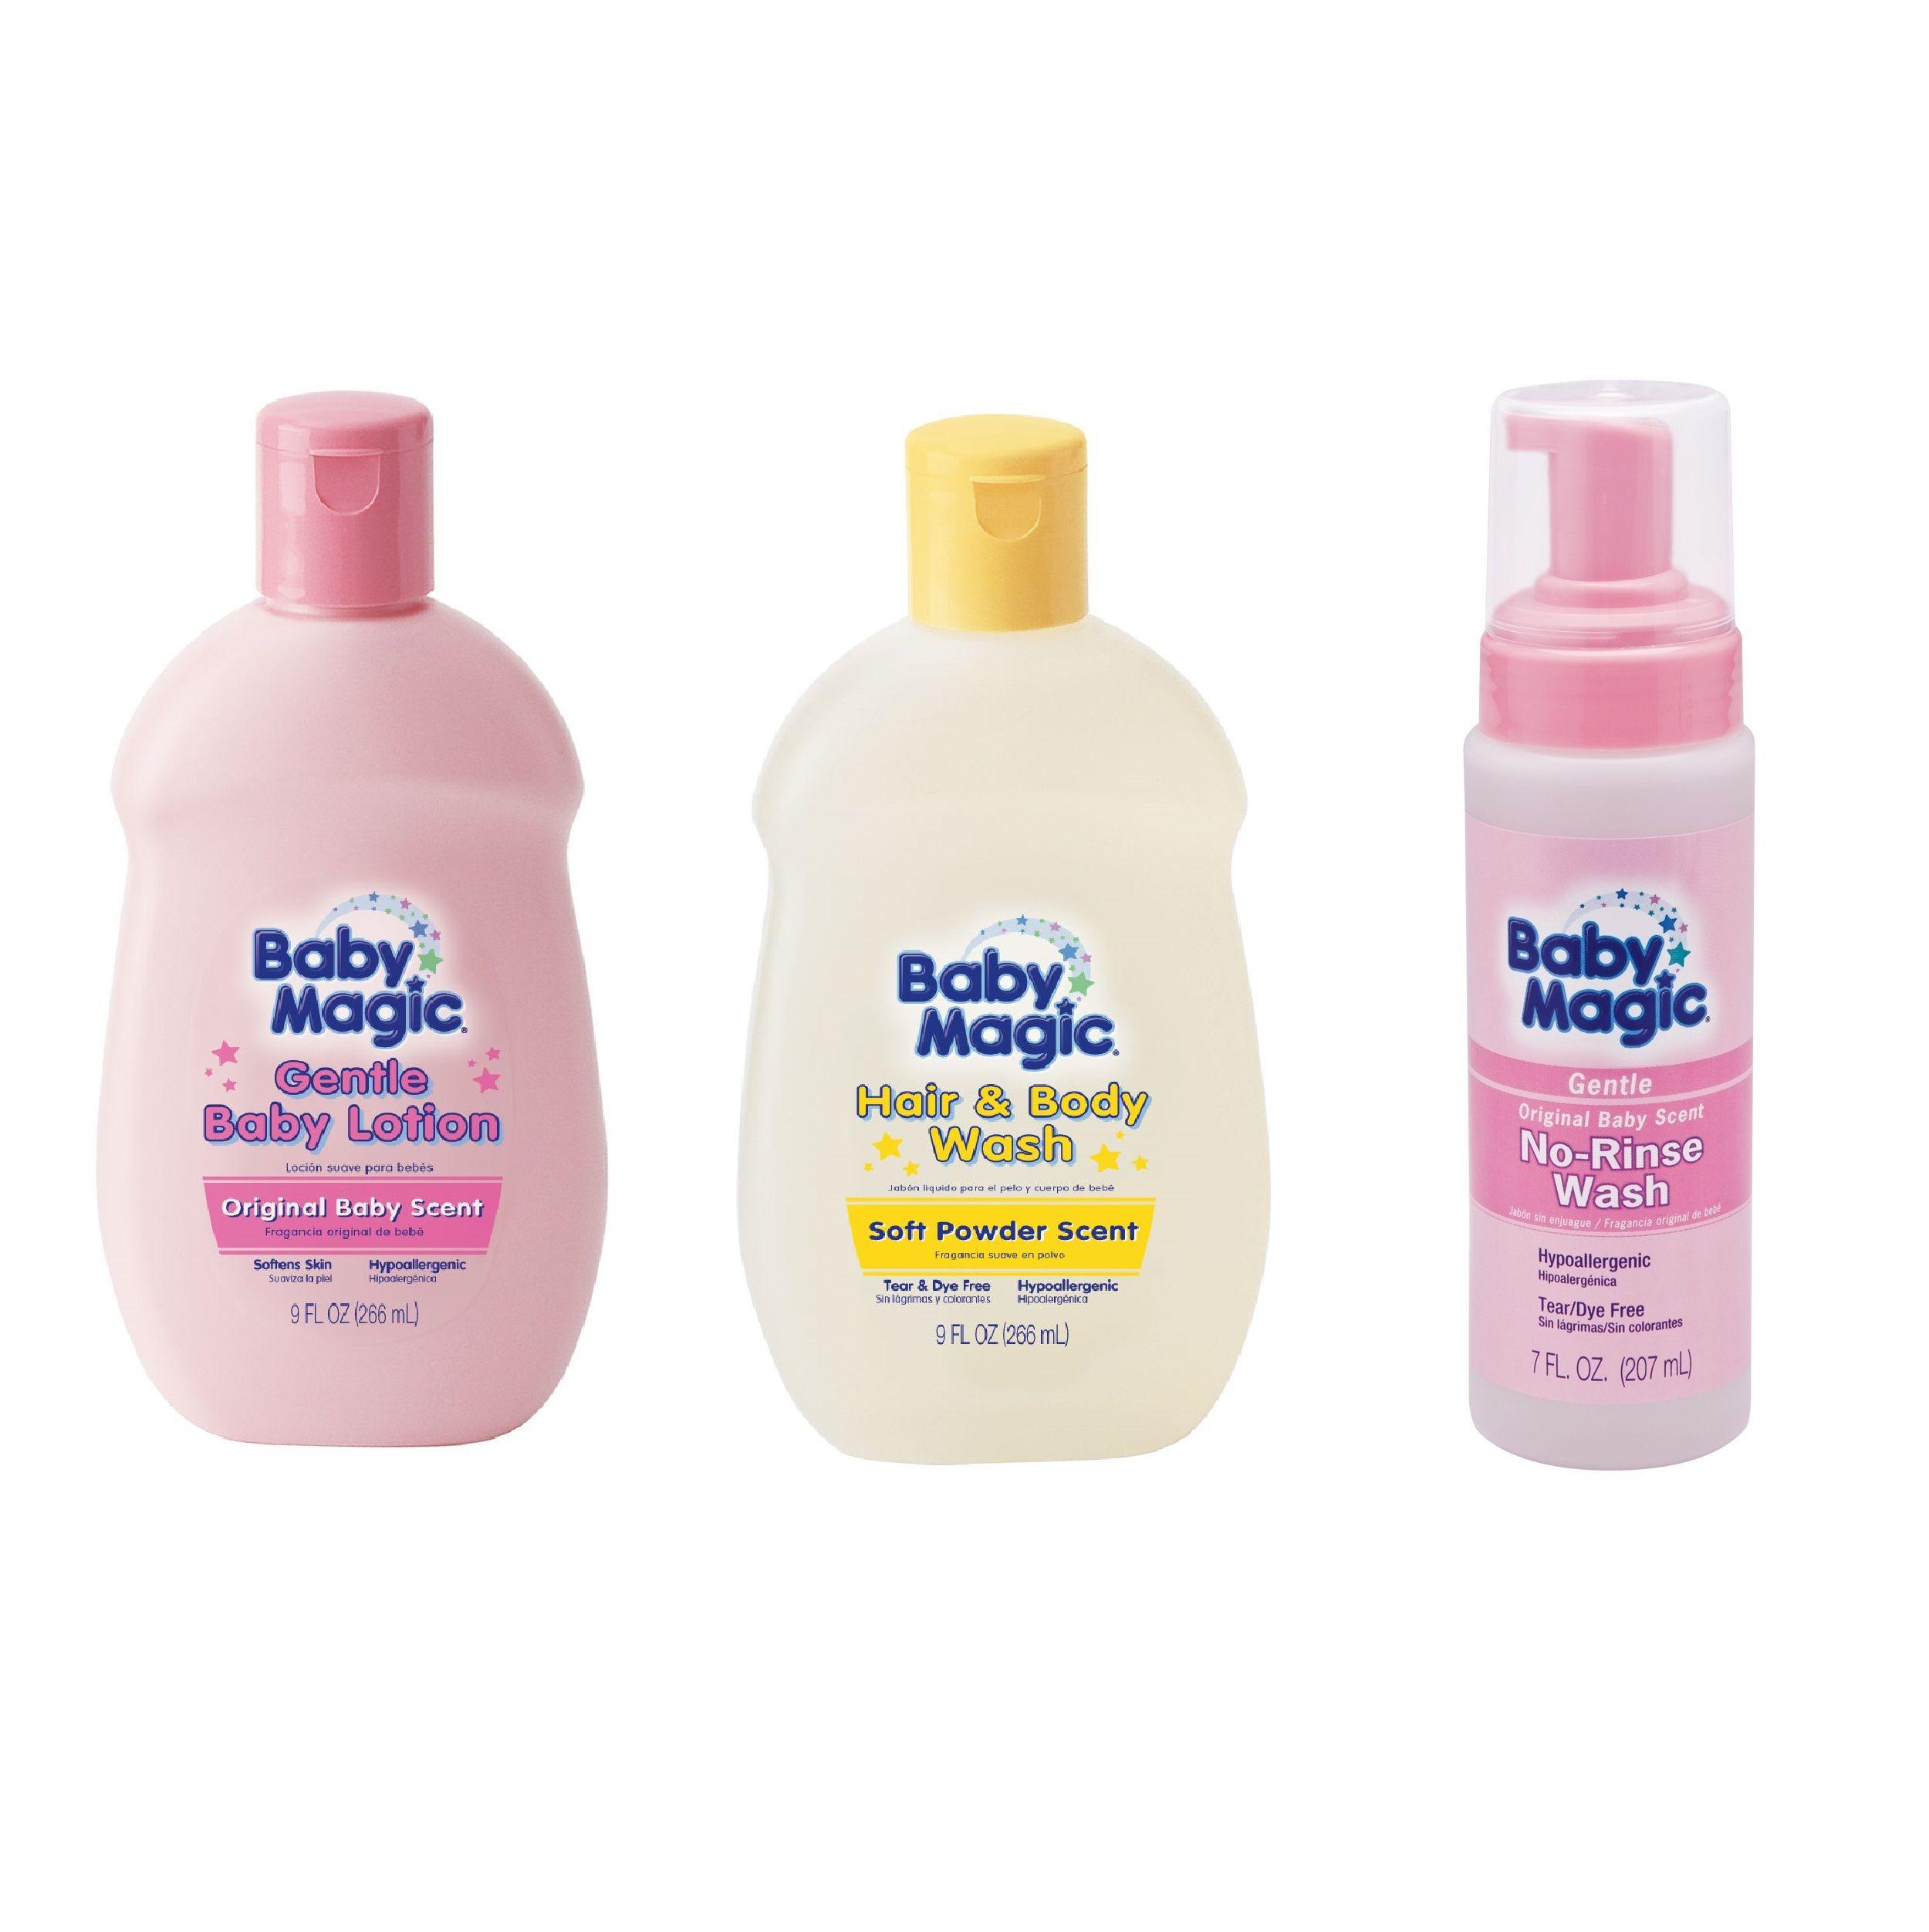 Baby Magic Lotion And Washes Baby Magic Baby Lotion Baby Wash